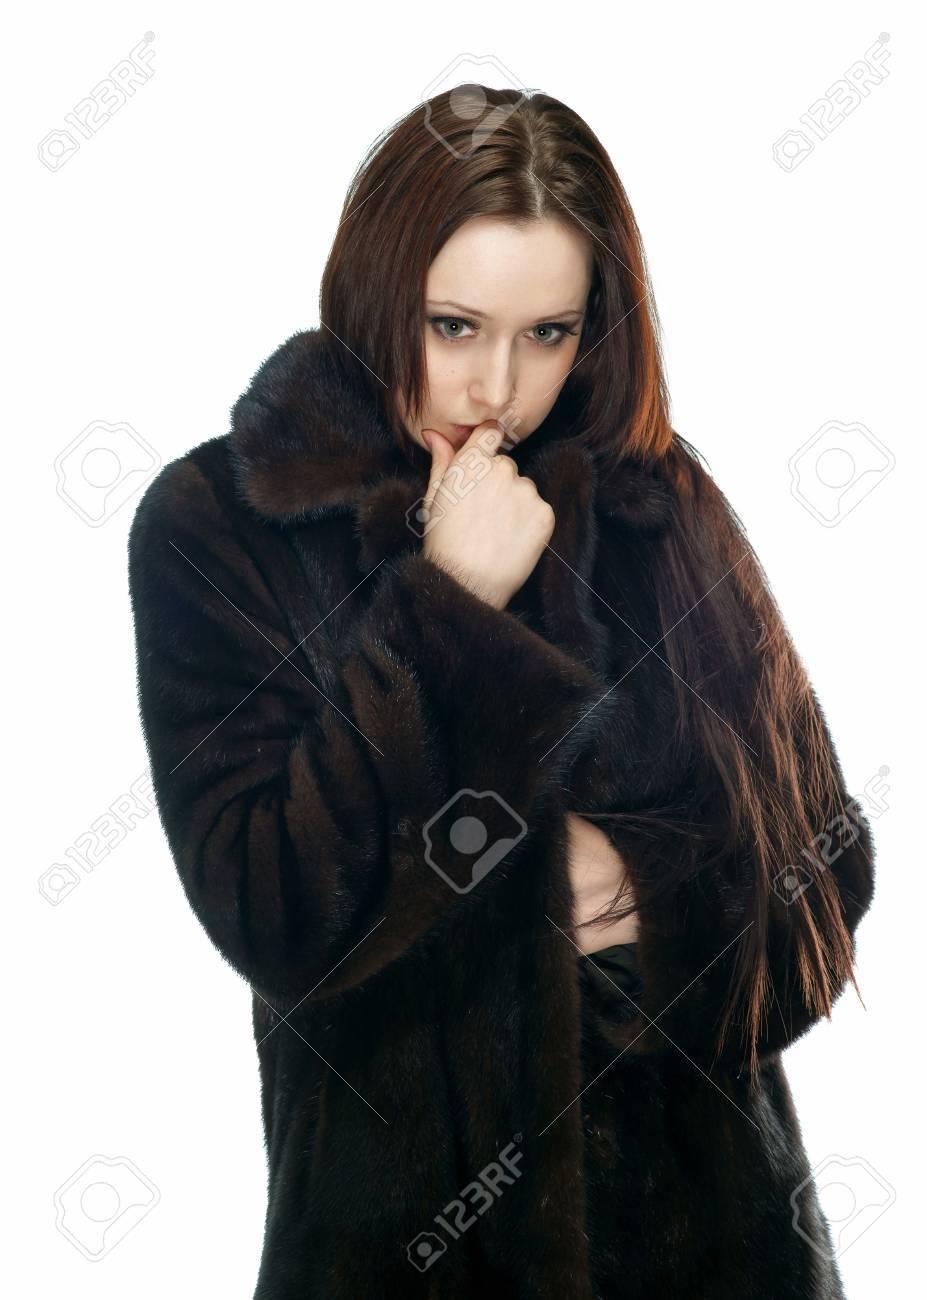 the sad girl in a fur coat Stock Photo - 13416129